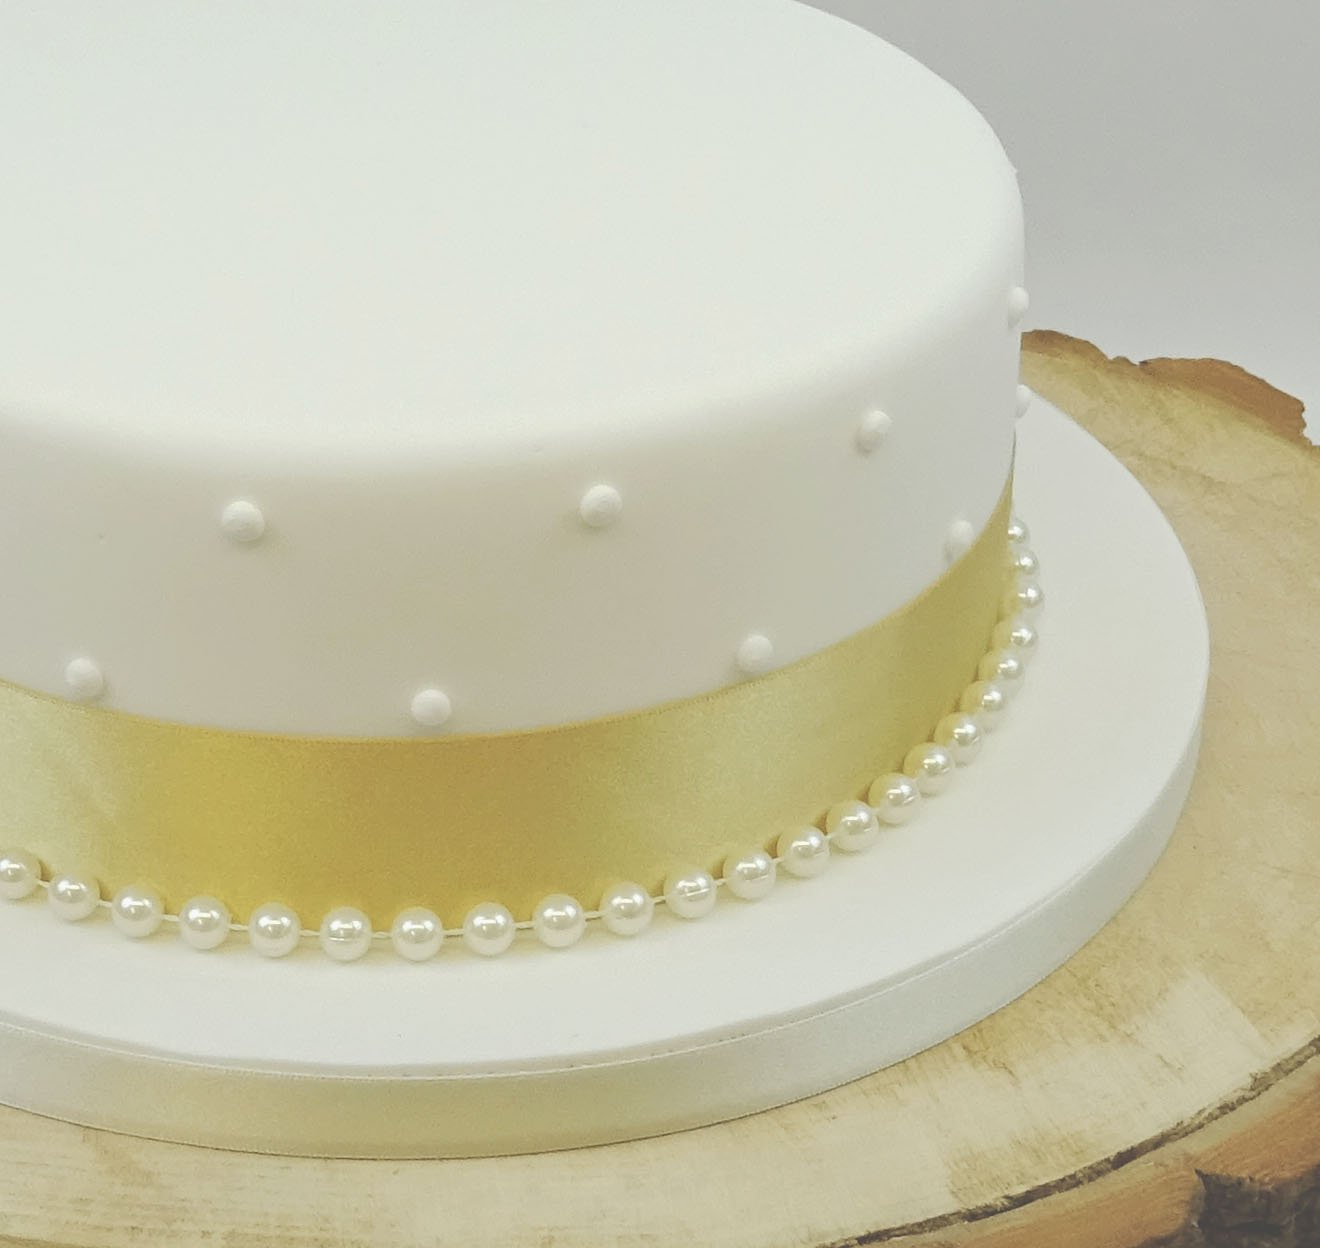 SATIN RIBBON 35mm & 8mm PEARLS CAKE DECORATION WEDDING CAKE TOPPER ...